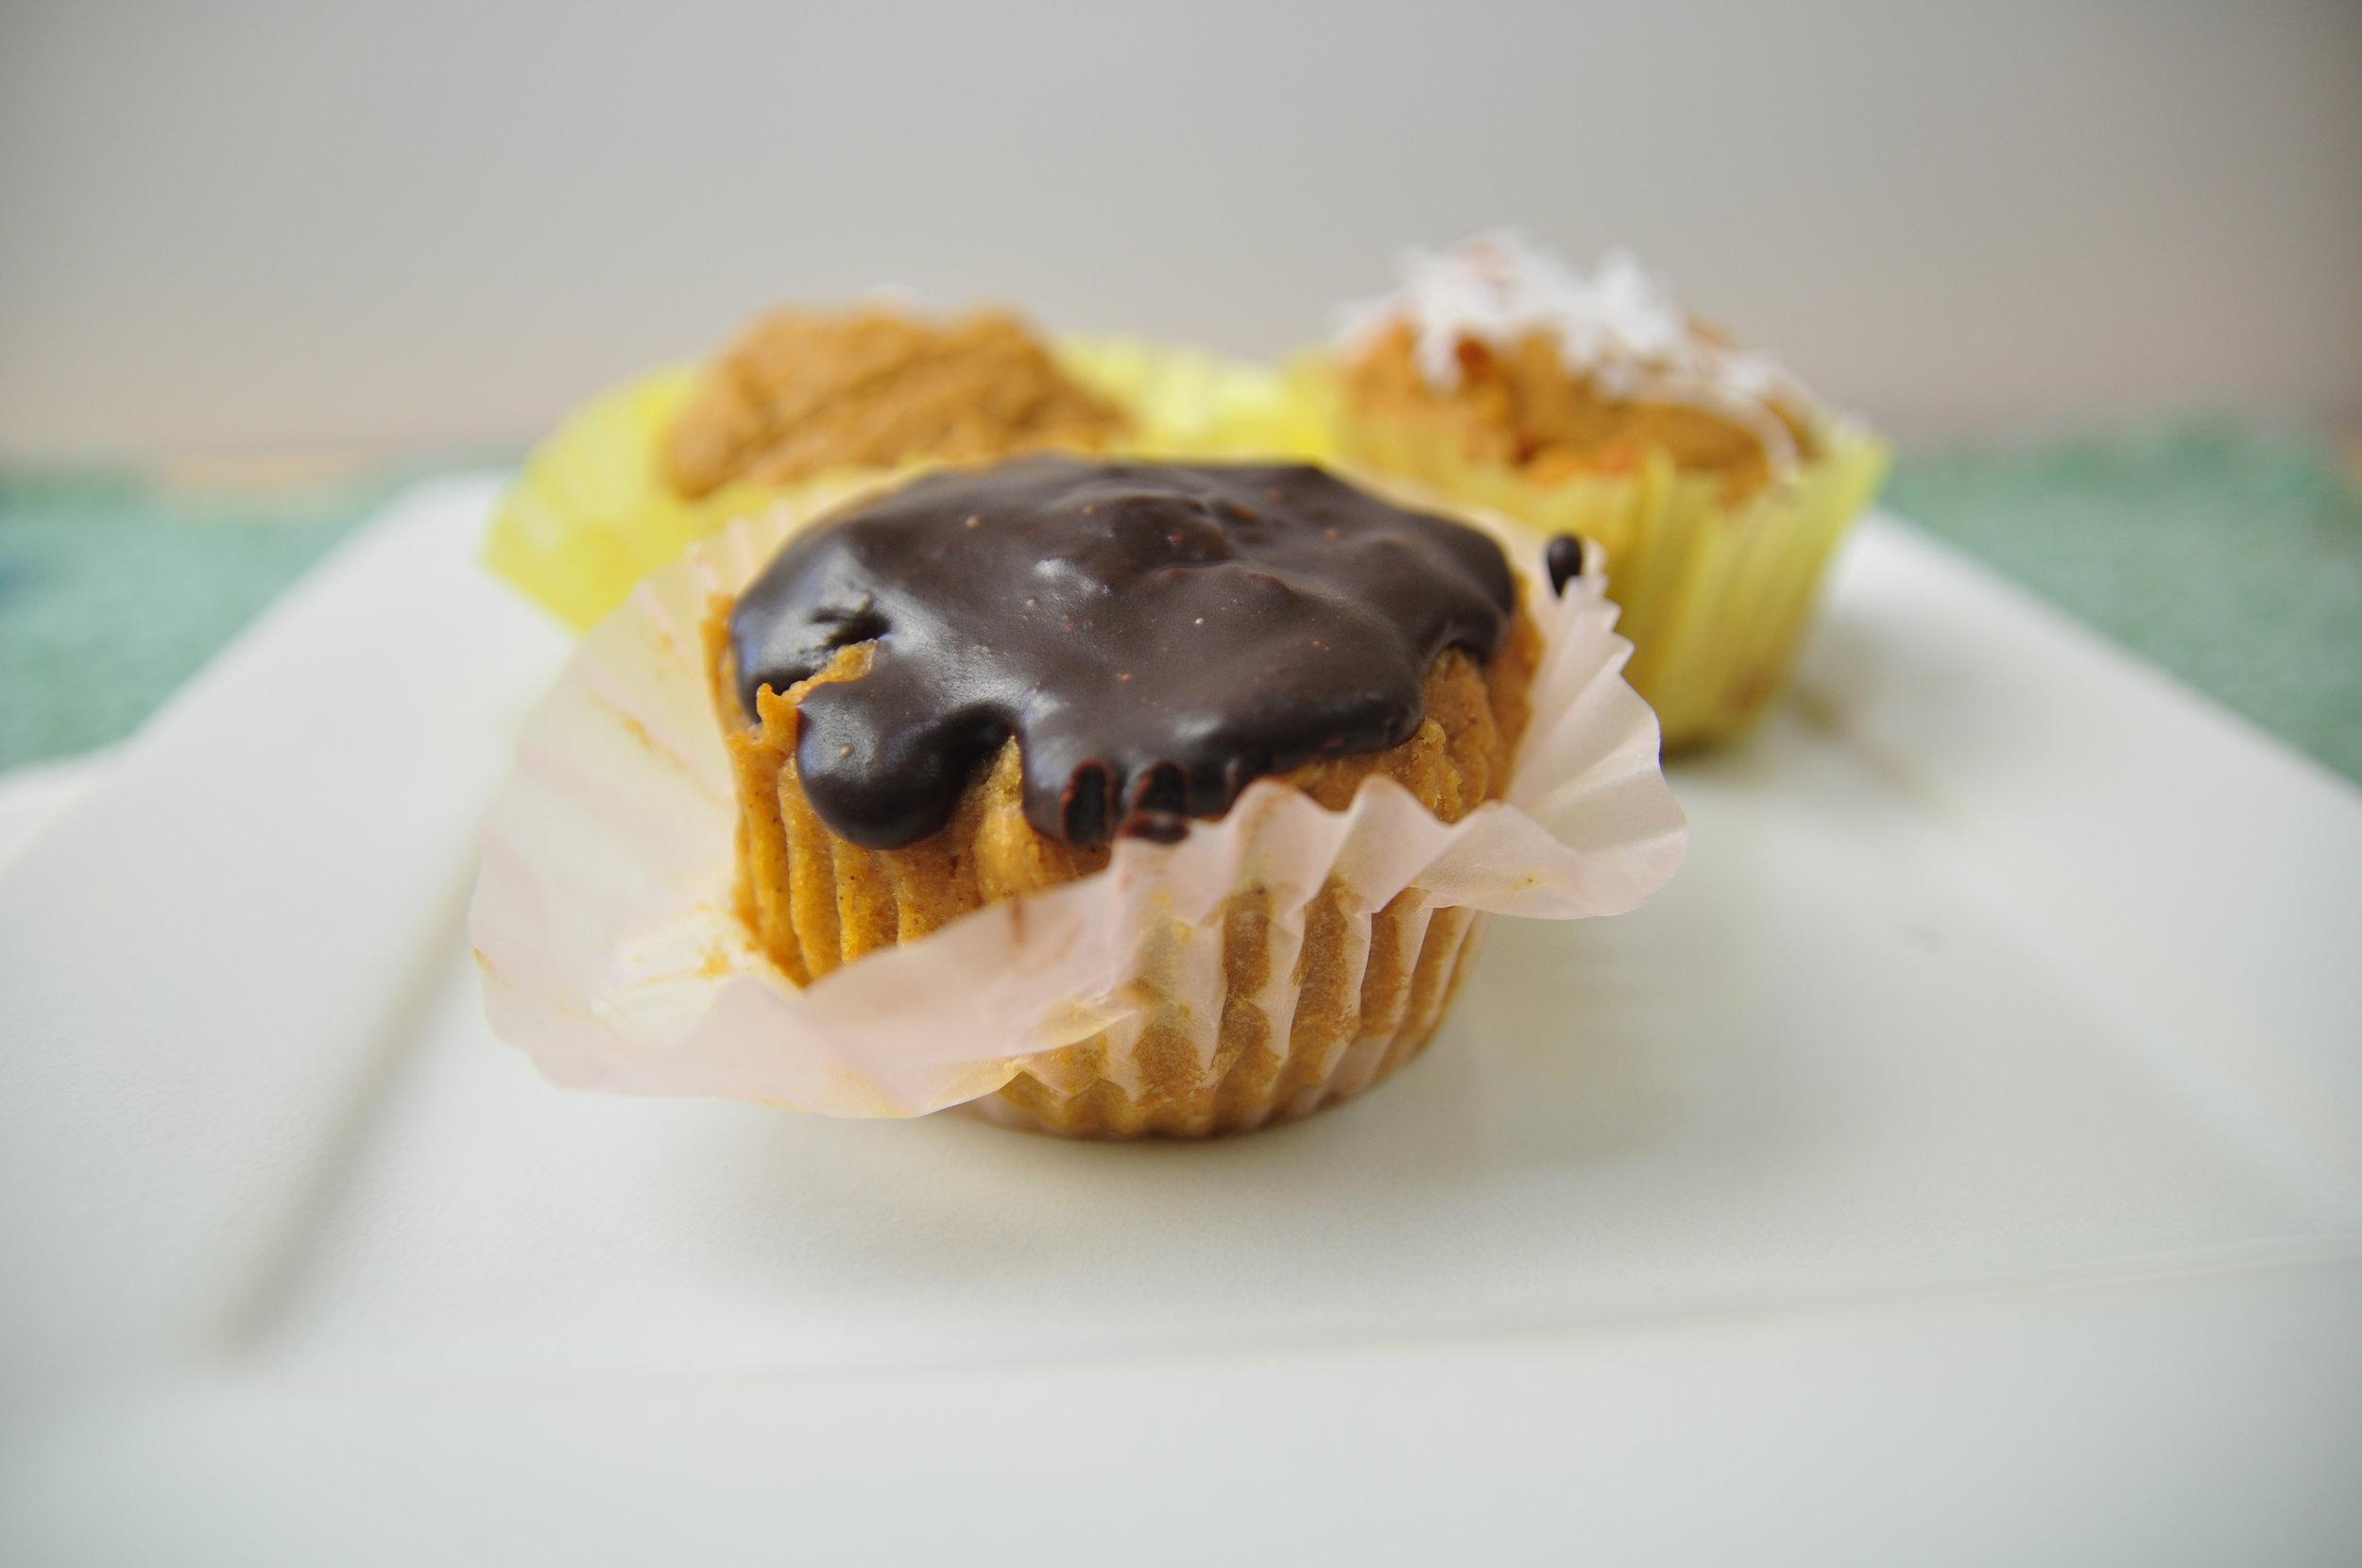 vegan-sw-potato-cupcakes-3.jpg